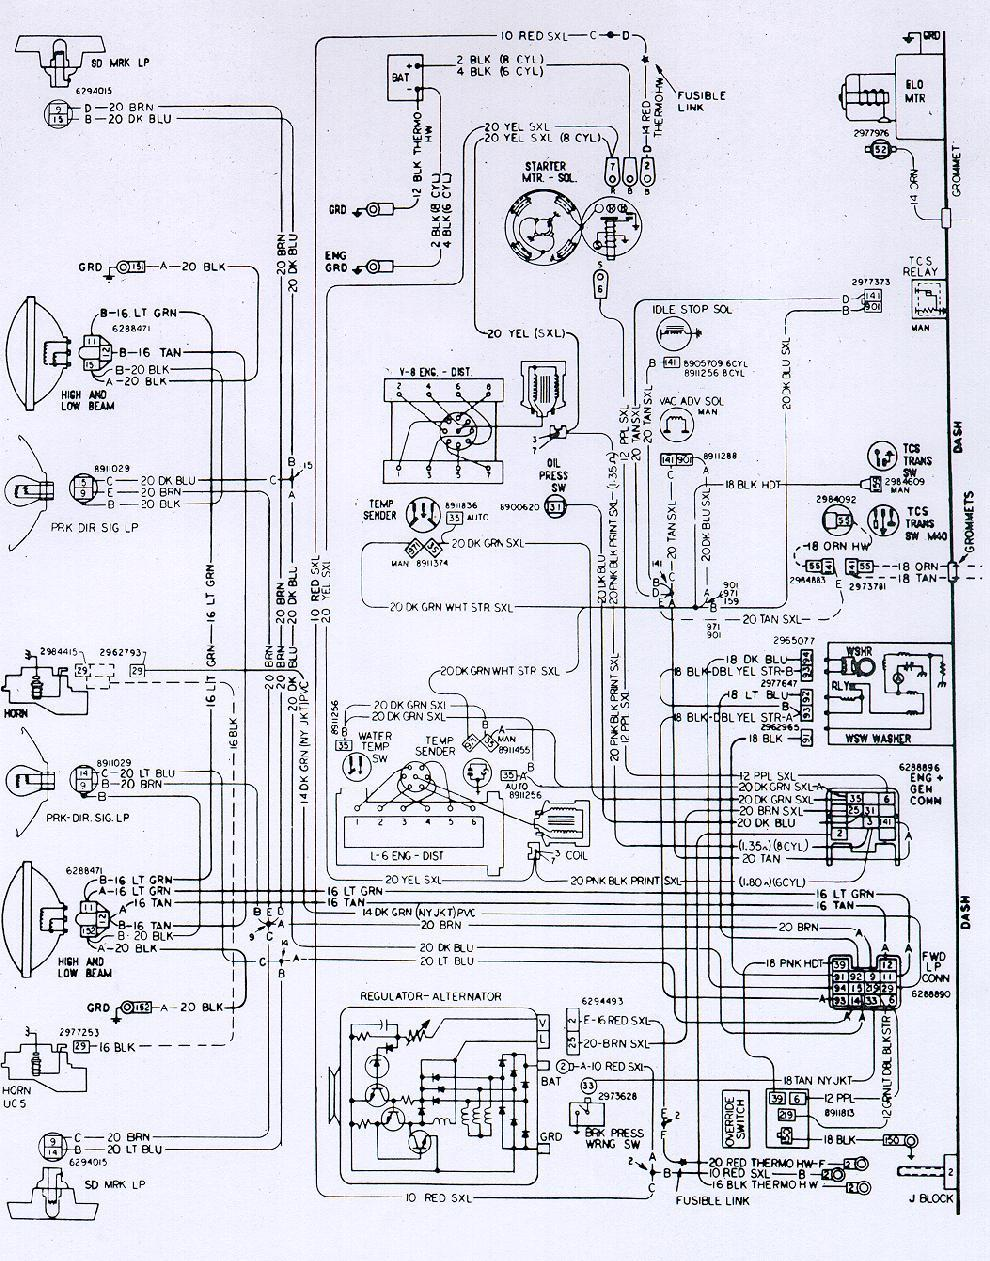 74eng 70 chevelle wiring harness diagram roslonek net,70 Chevelle Wiring Harness Diagram